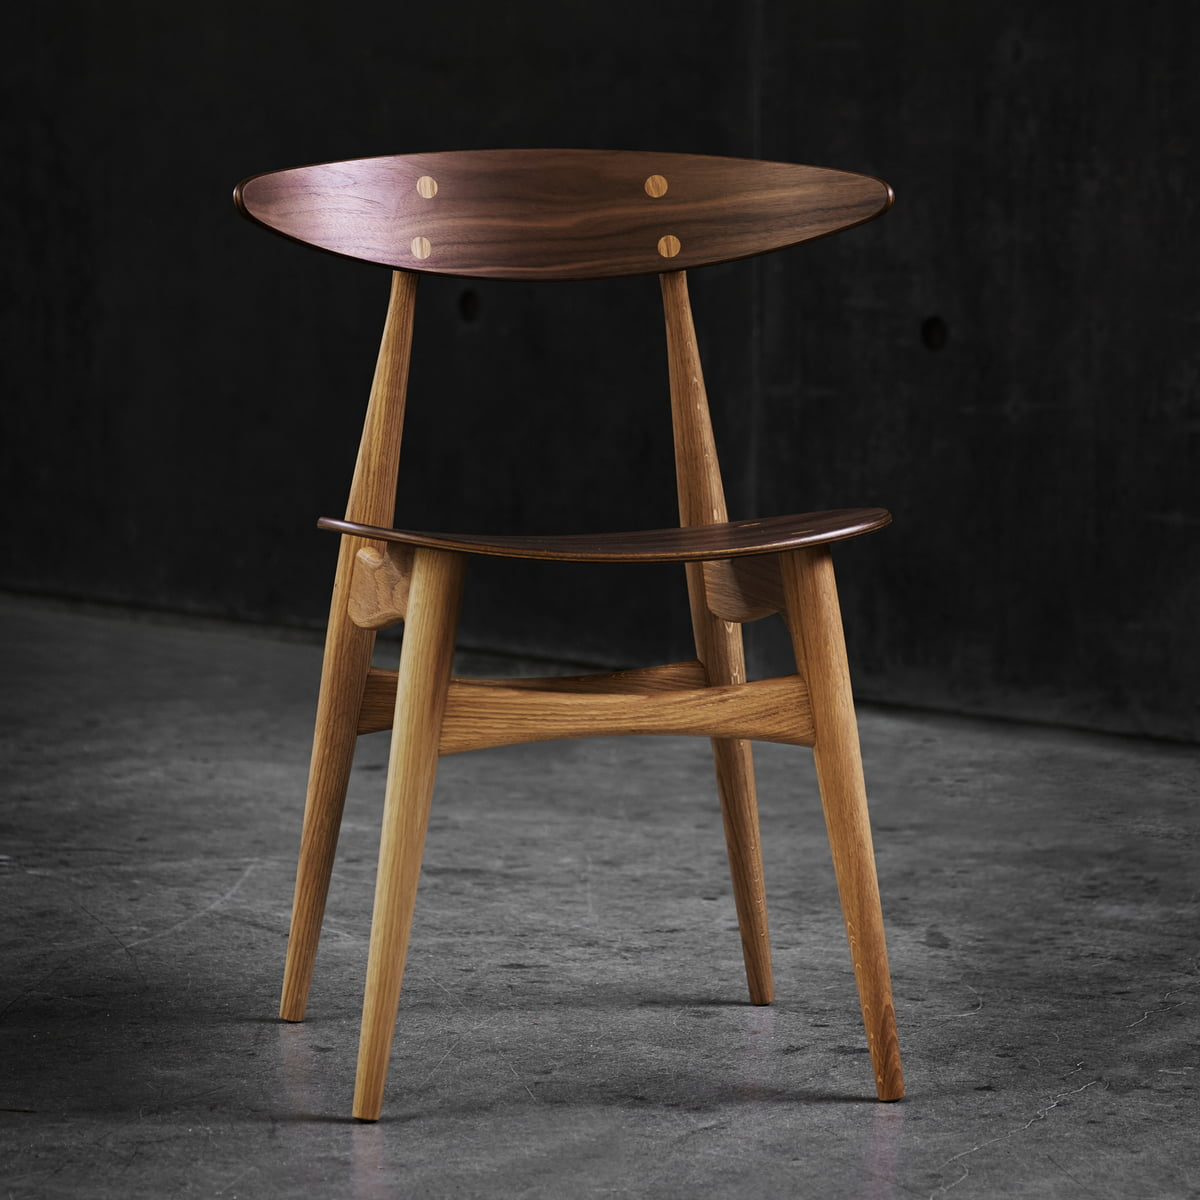 carl hansen ch33 t stuhl im wohndesign shop. Black Bedroom Furniture Sets. Home Design Ideas